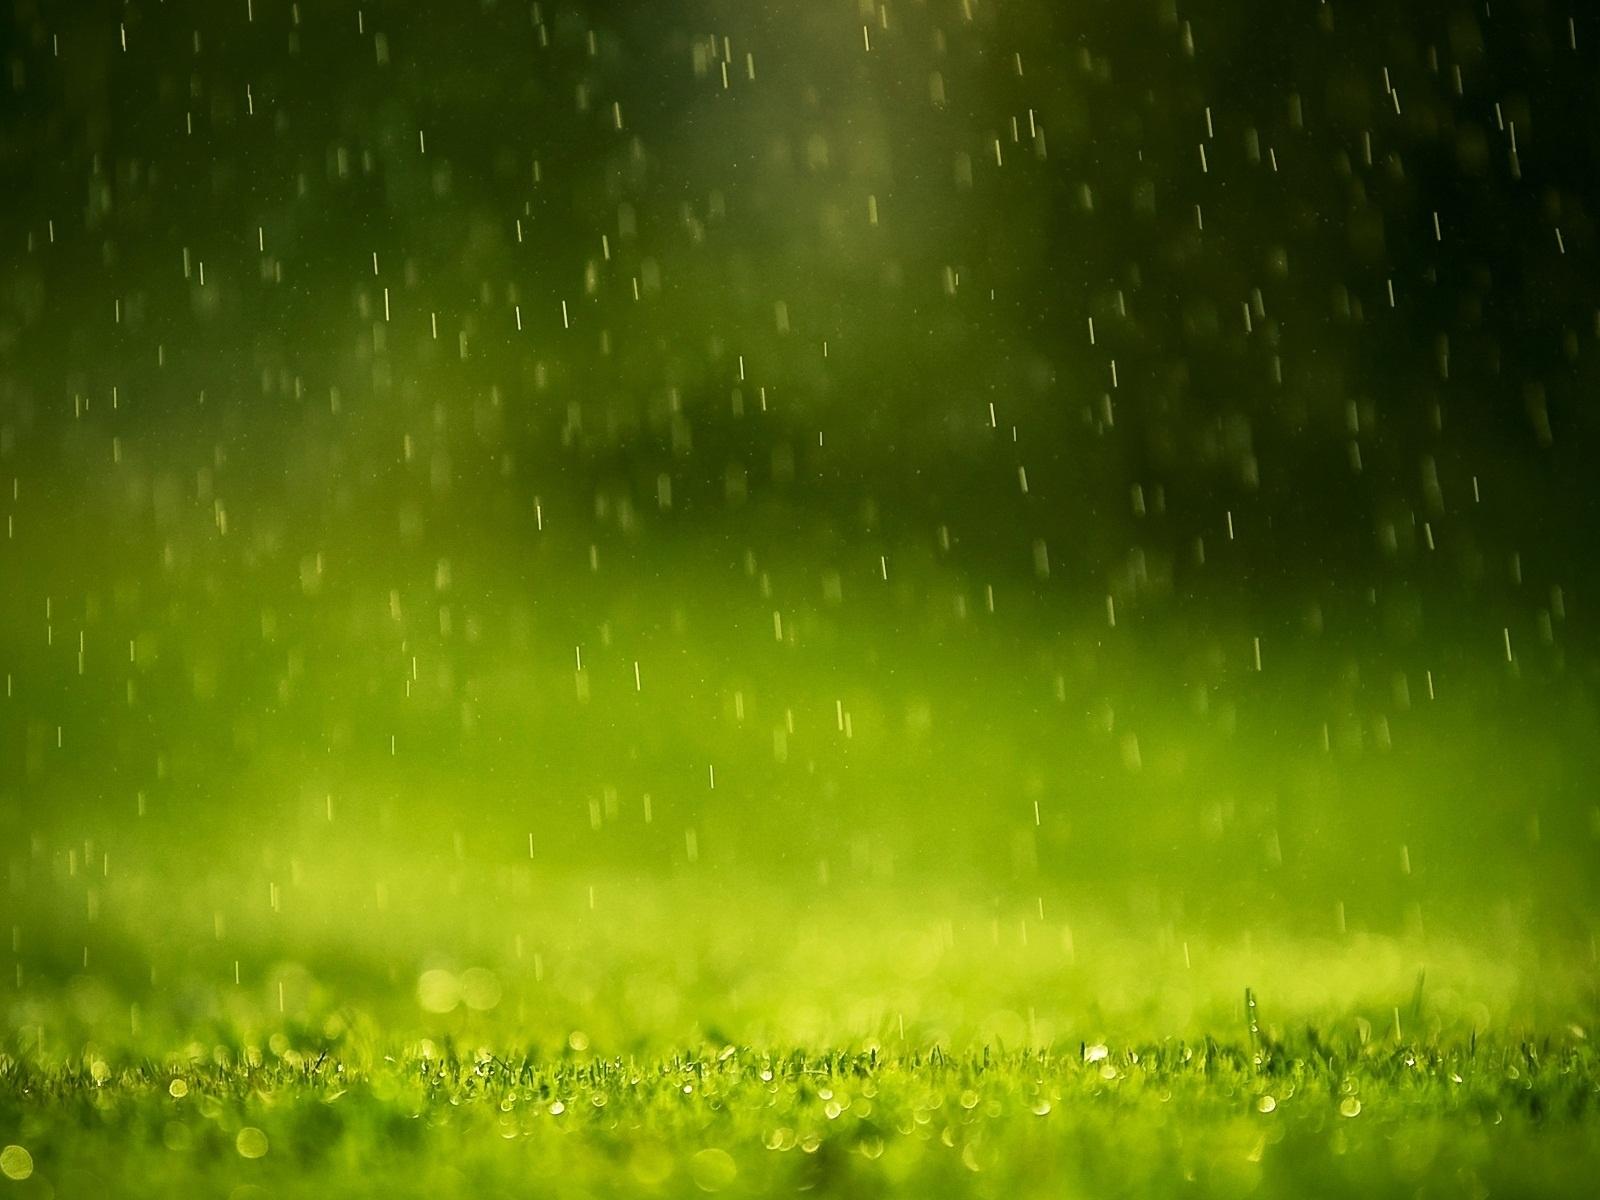 Raining on Grass Macro Photography HD Wallpaper HD Nature Wallpapers 1600x1200